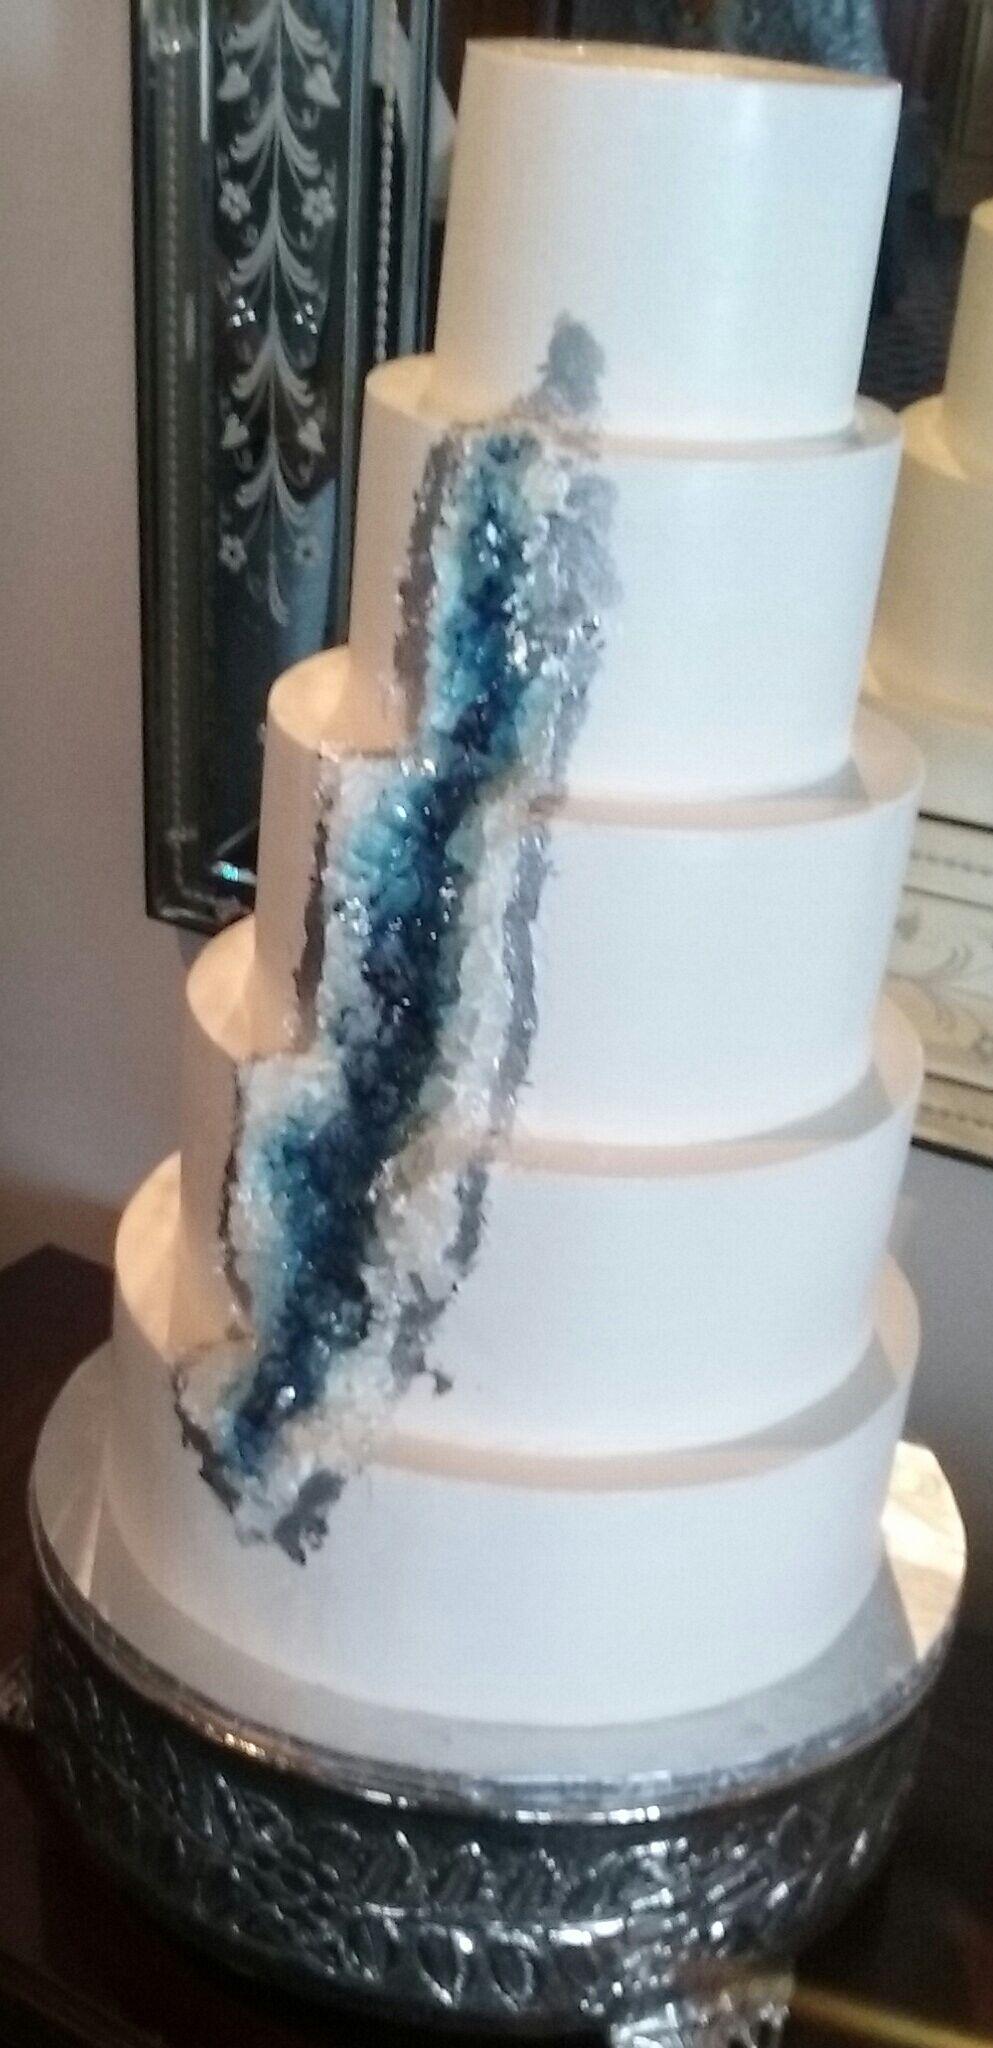 The Cake Hag Dessert Studio